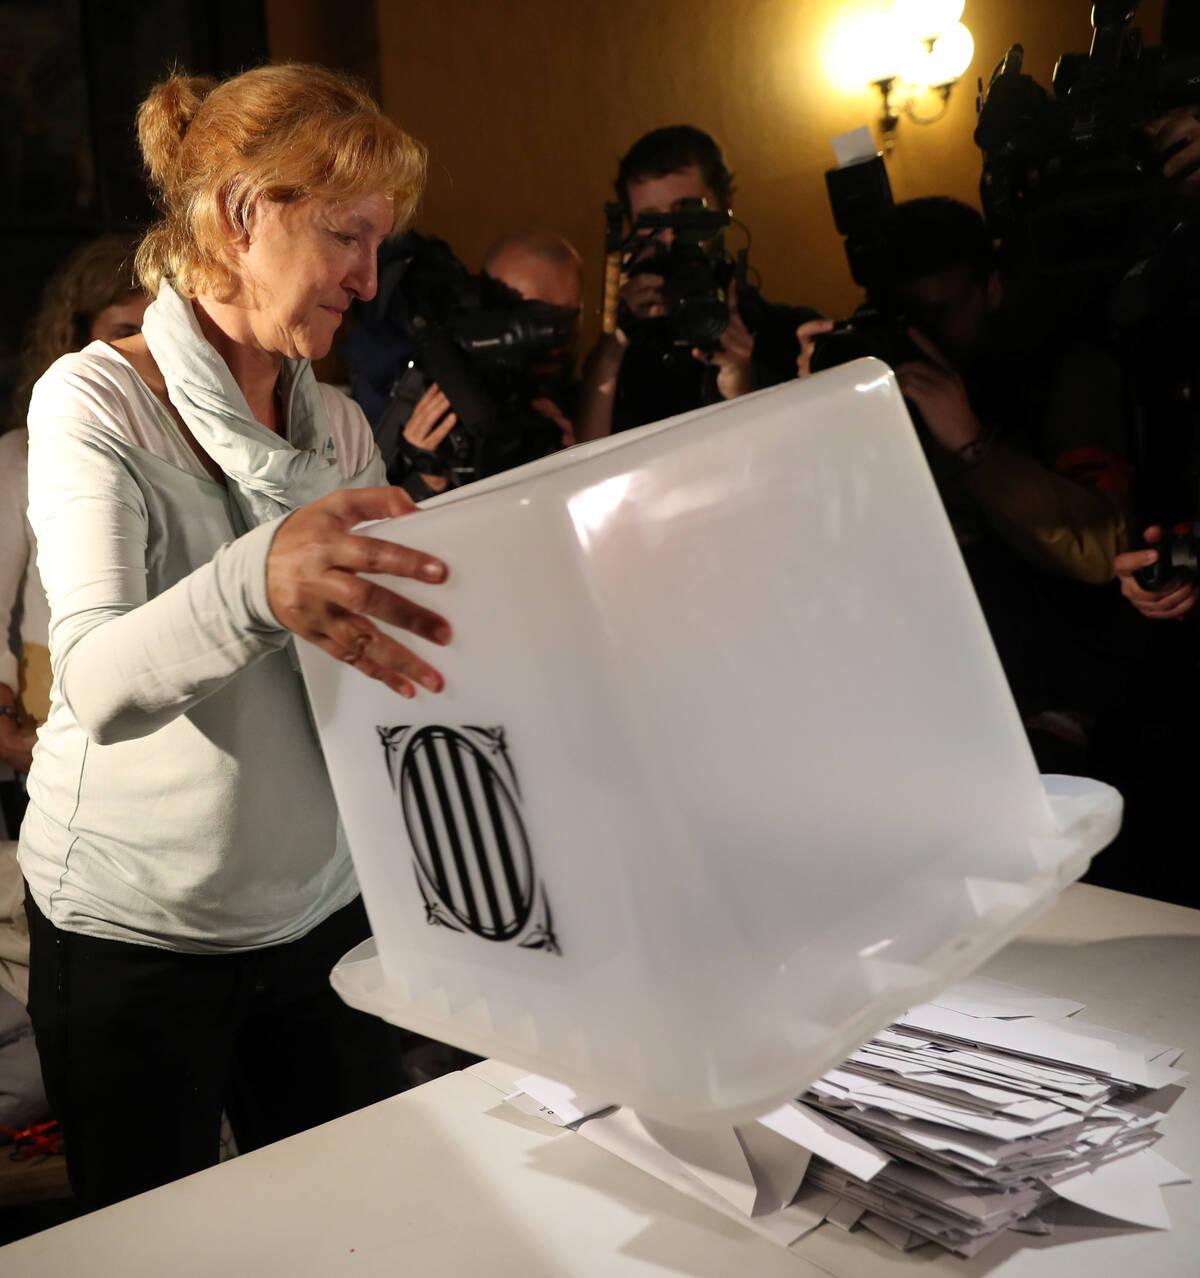 2017 10 01T184414Z 569162622 RC192EDCB0F0 RTRMADP 3 SPAIN POLITICS CATALONIA